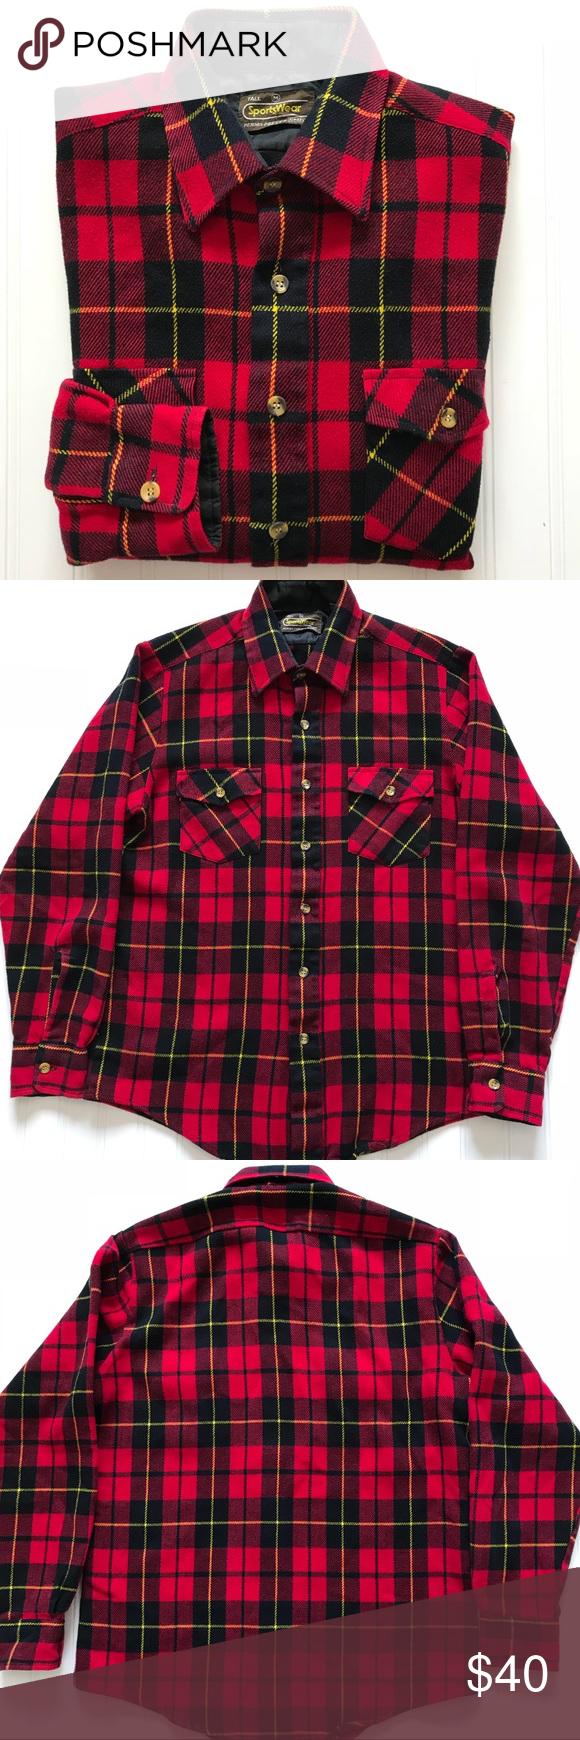 Red flannel 2018  Vintage Buffalo Plaid Flannel Shirt M in   My Posh Picks